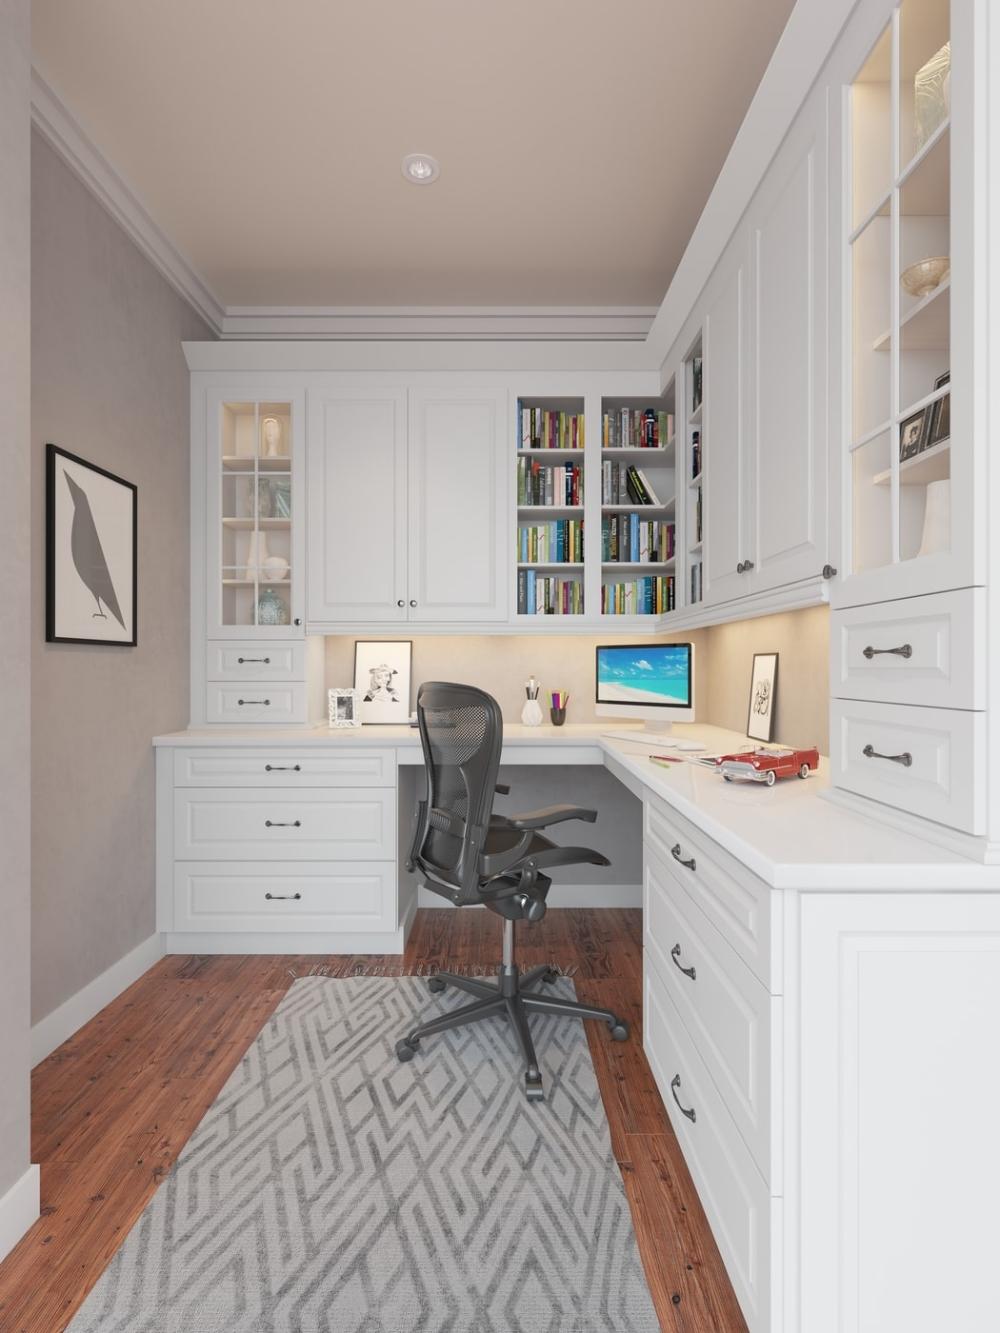 Dakota White Rta Kitchen Cabinets The Rta Store Home Office Design Home Office Cabinets Home Office Layouts